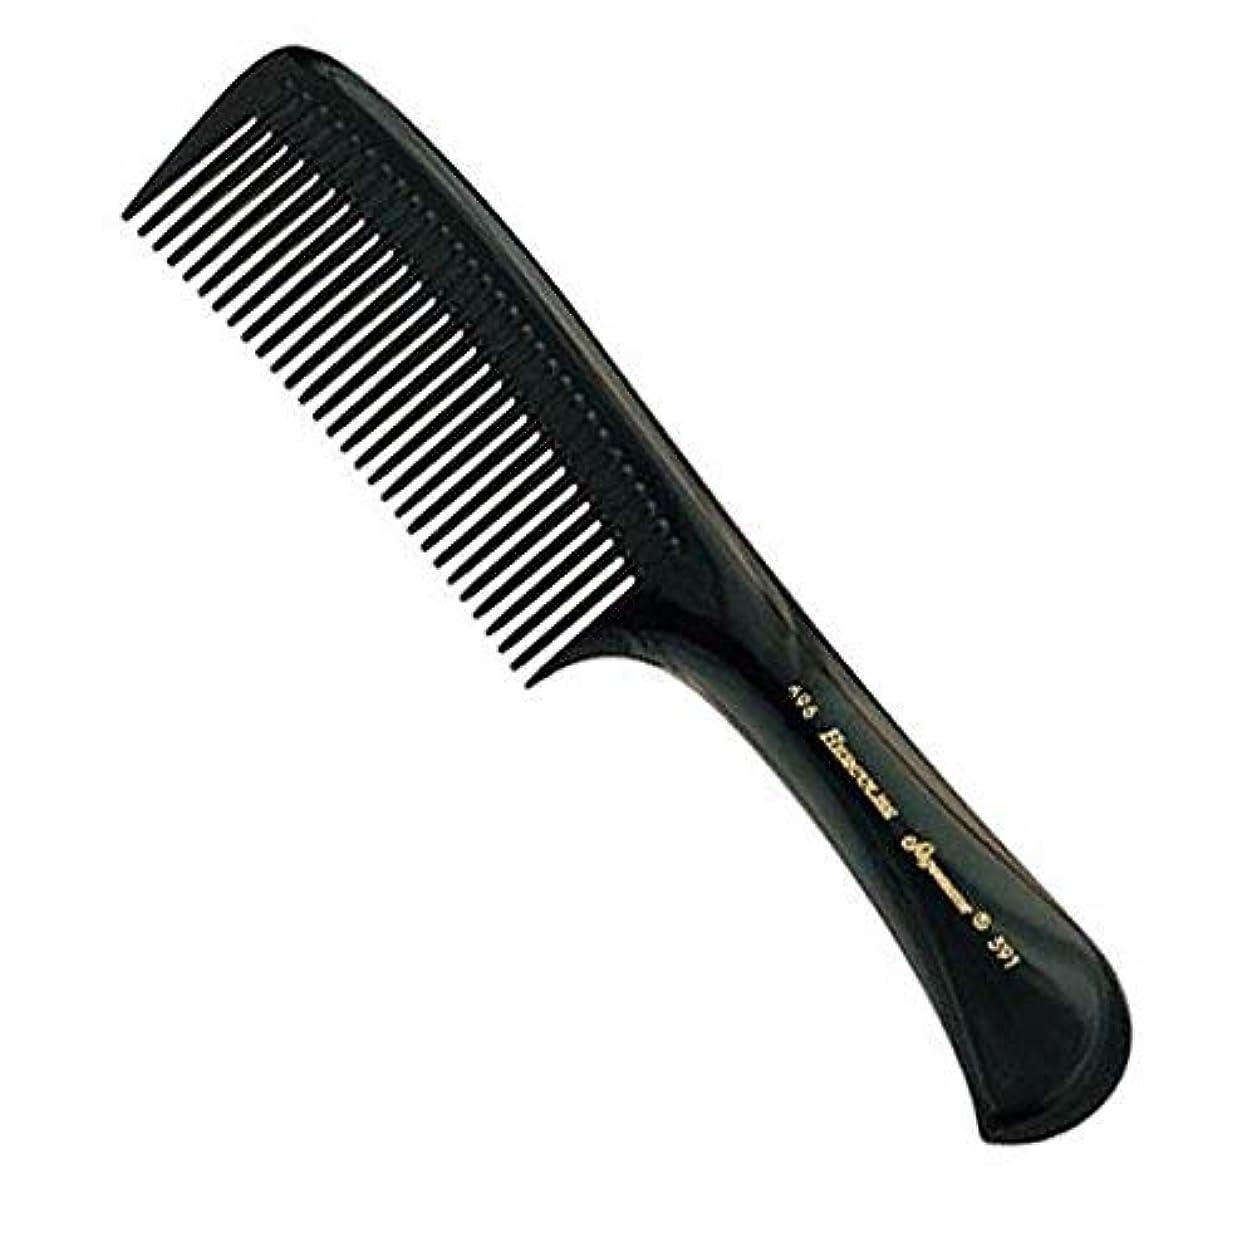 運河手綱不潔Hercules Sagemann Seamless Handle Detangling Hair Comb, 22.7 cm Length [並行輸入品]